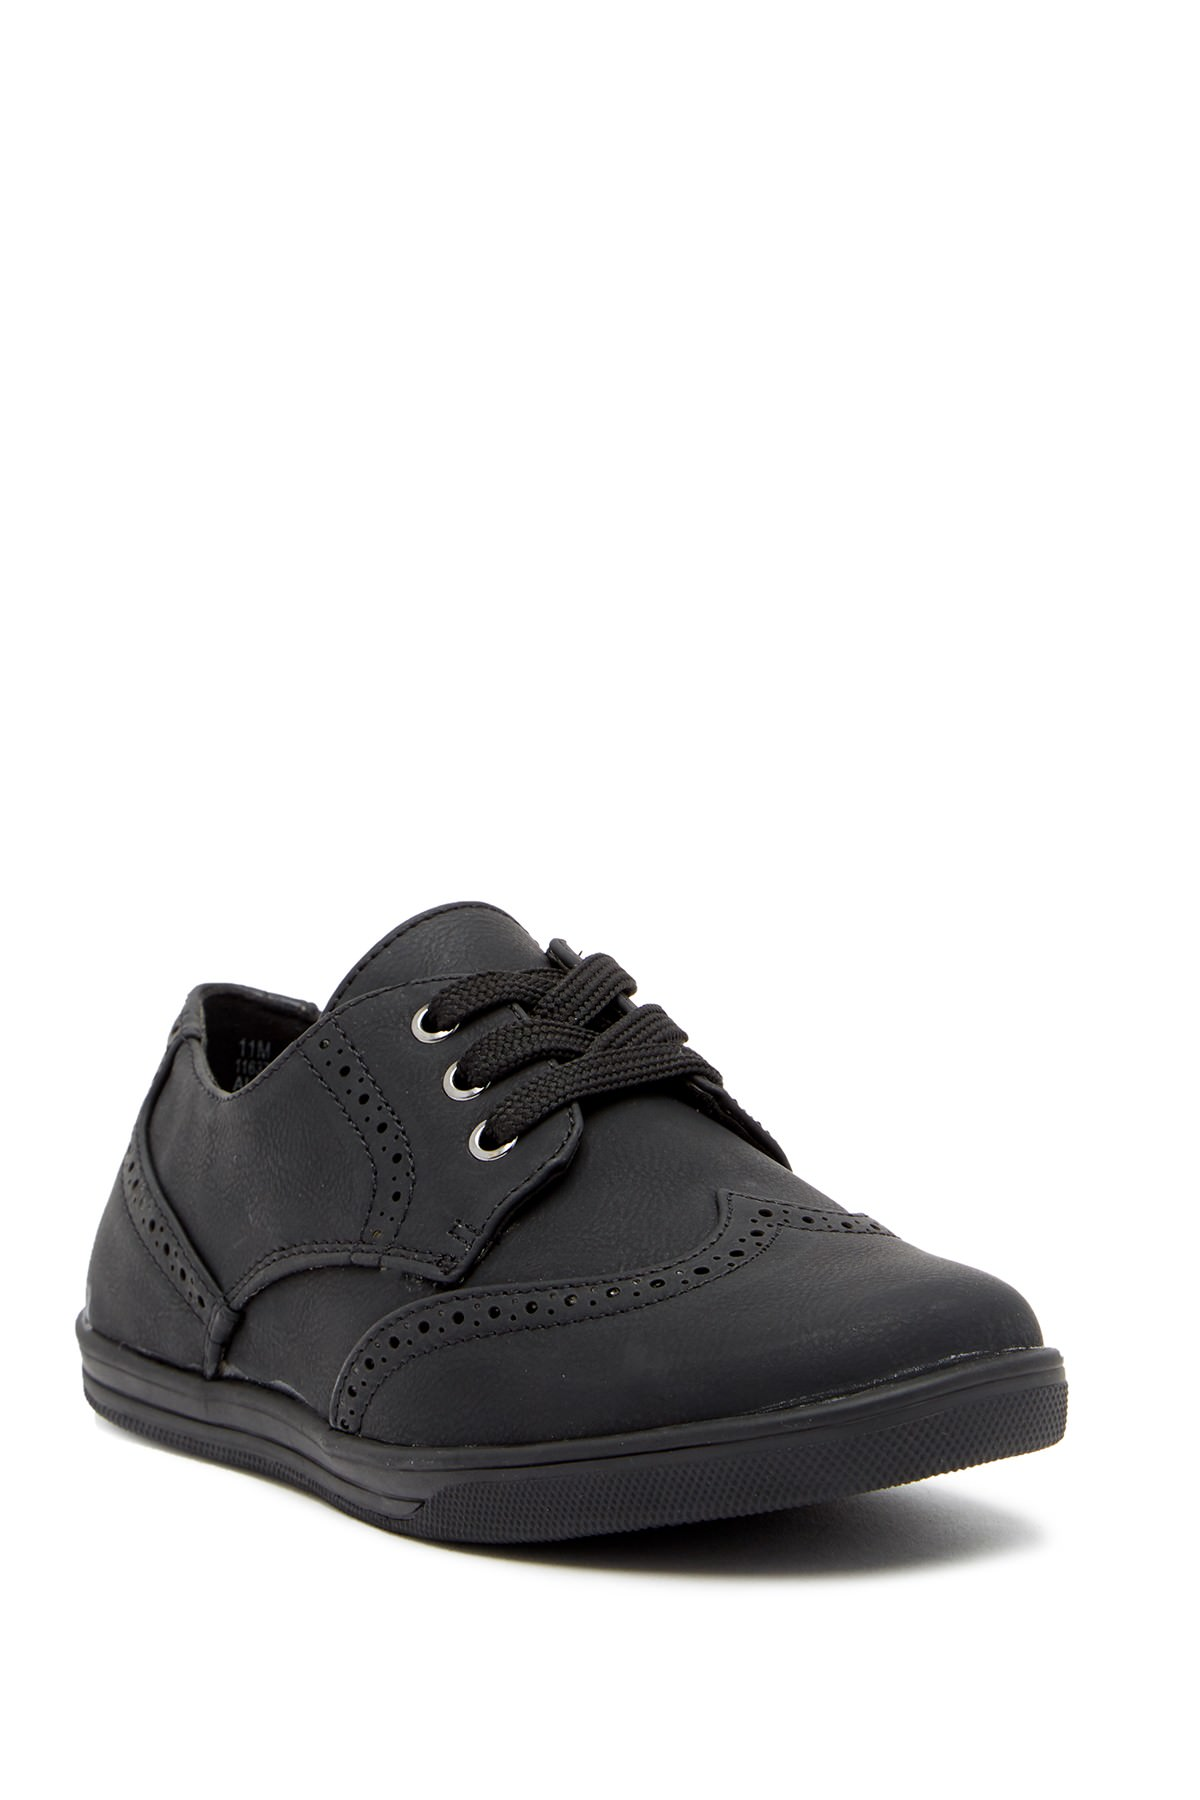 Scott David Chandler Toddler Youth Boys Black Wingtip Sneaker Shoes